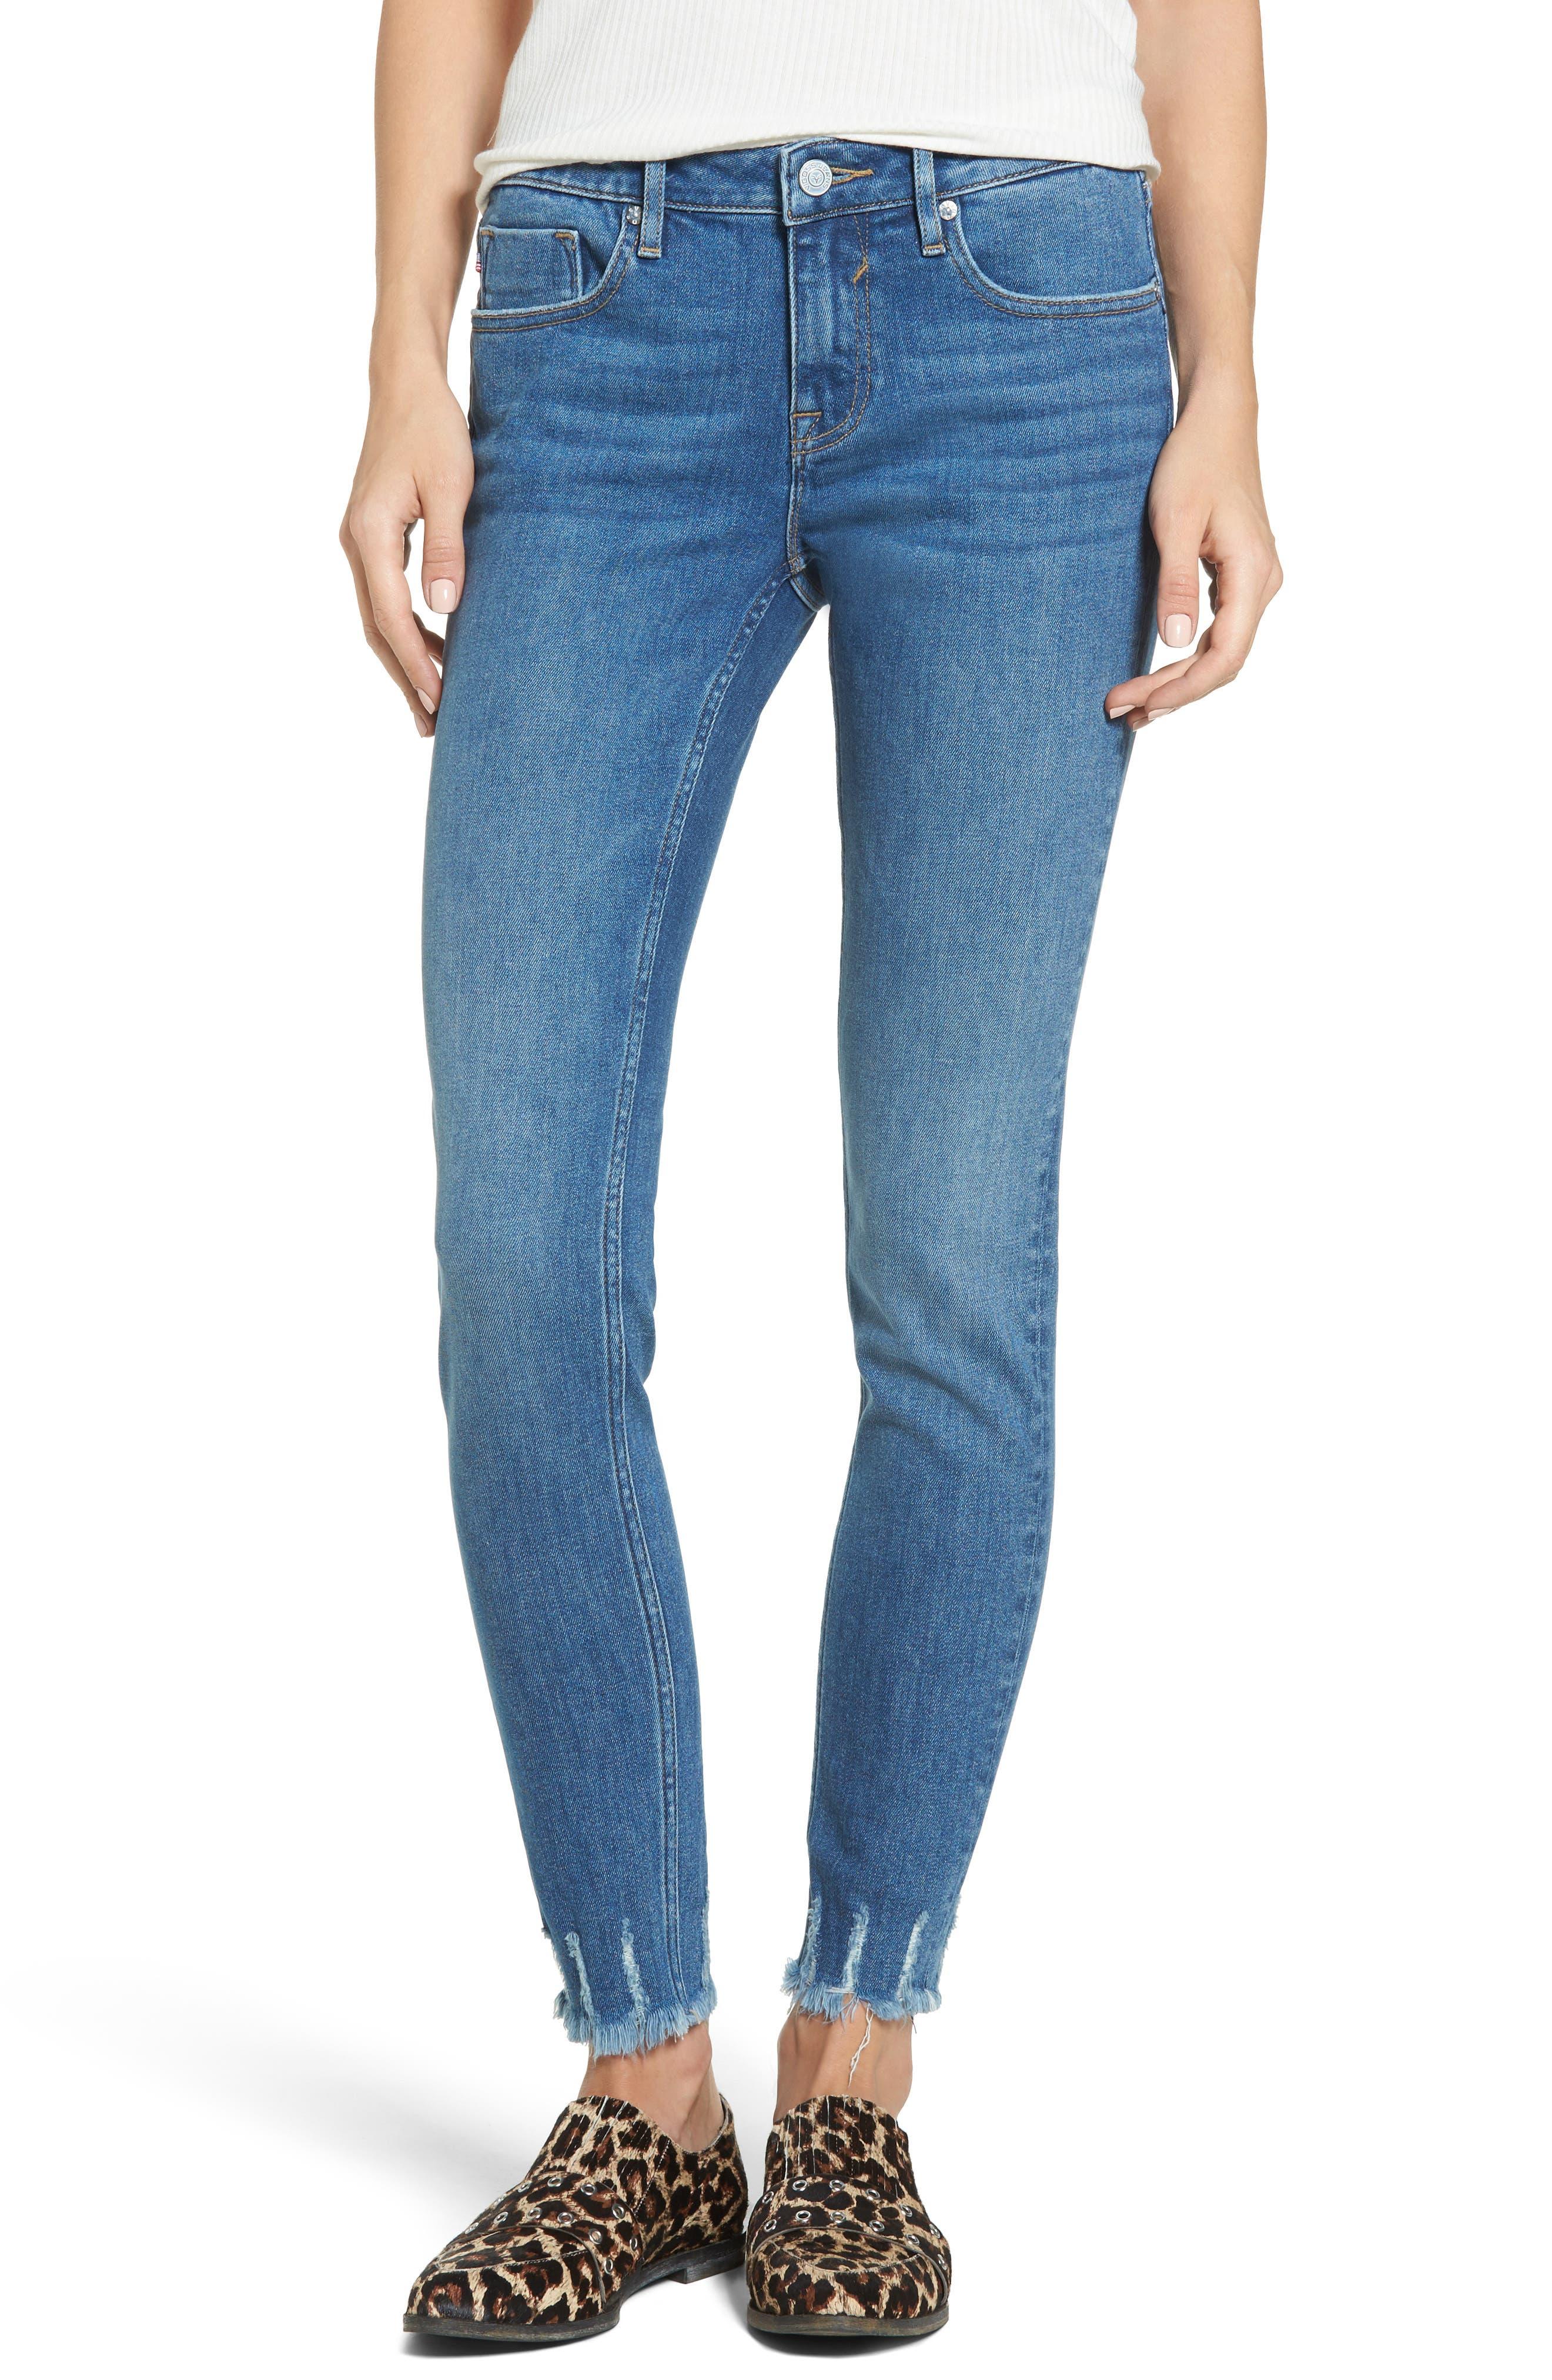 Jagger Skinny Jeans,                             Main thumbnail 1, color,                             426